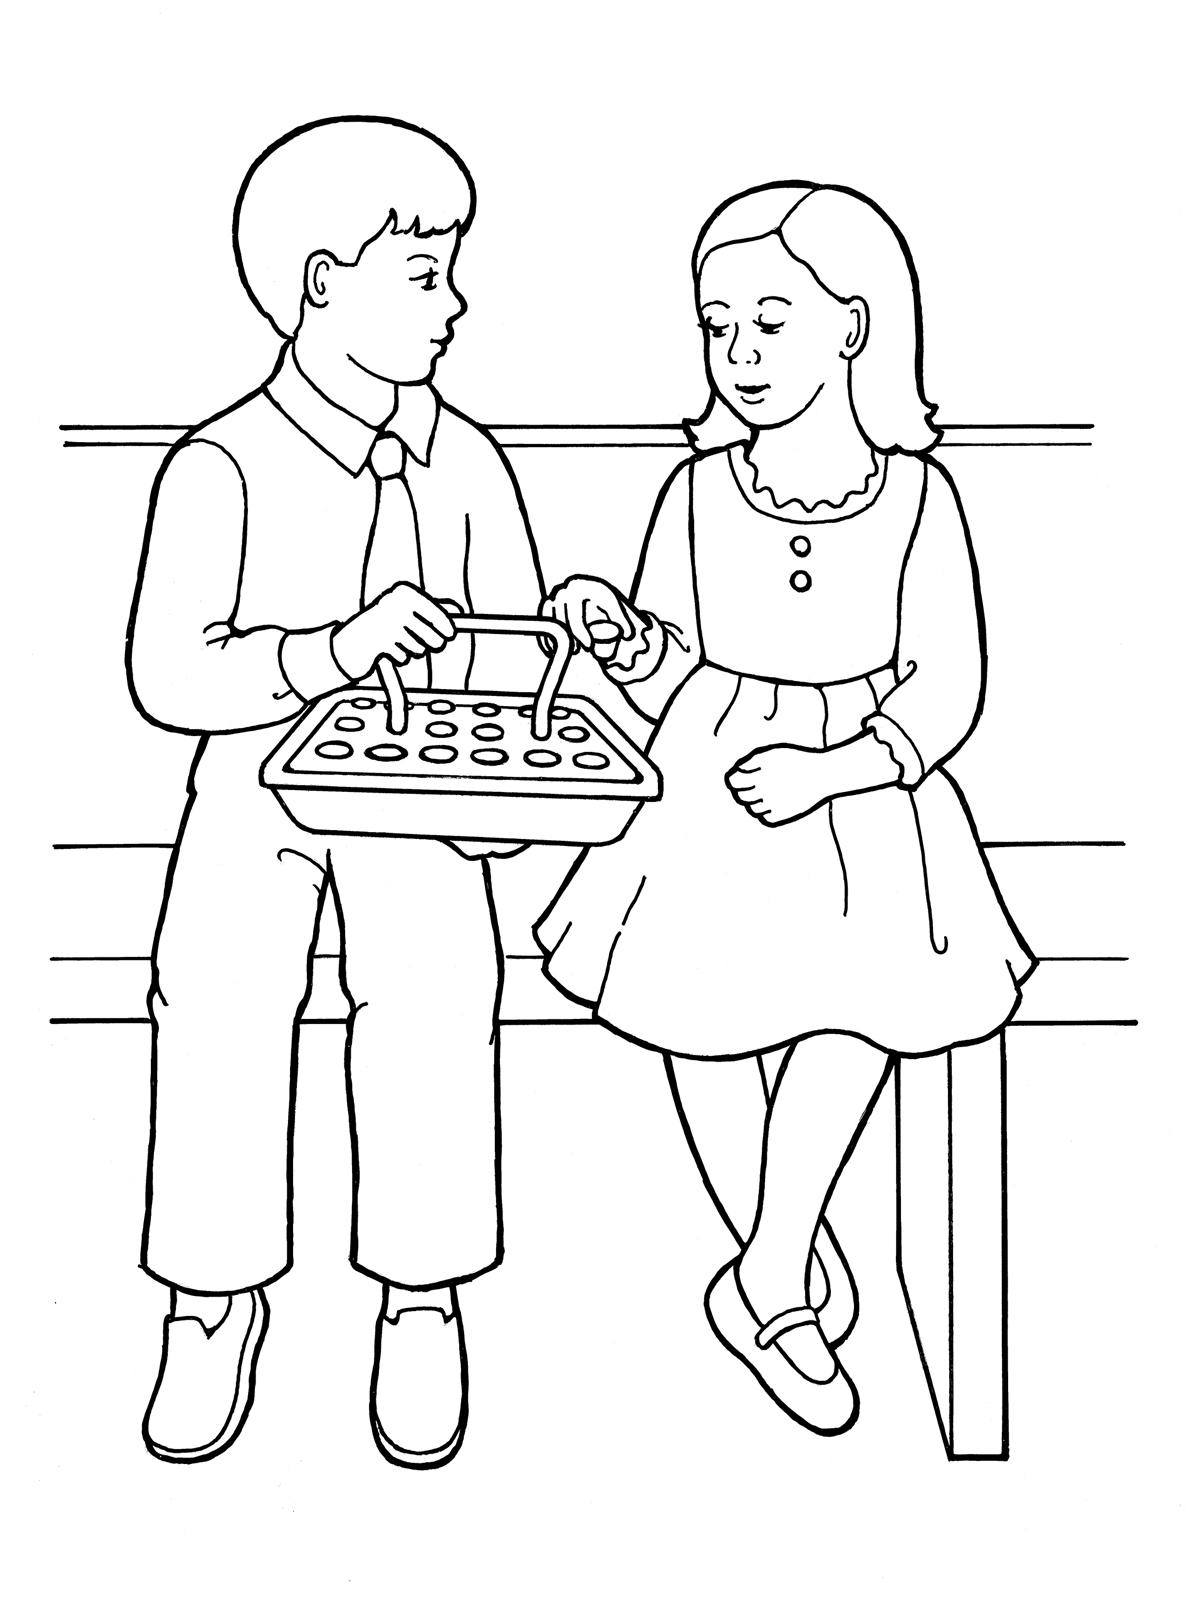 Catholic sacraments coloring pages our deseret homeschool gospel basics 38 week lesson plan